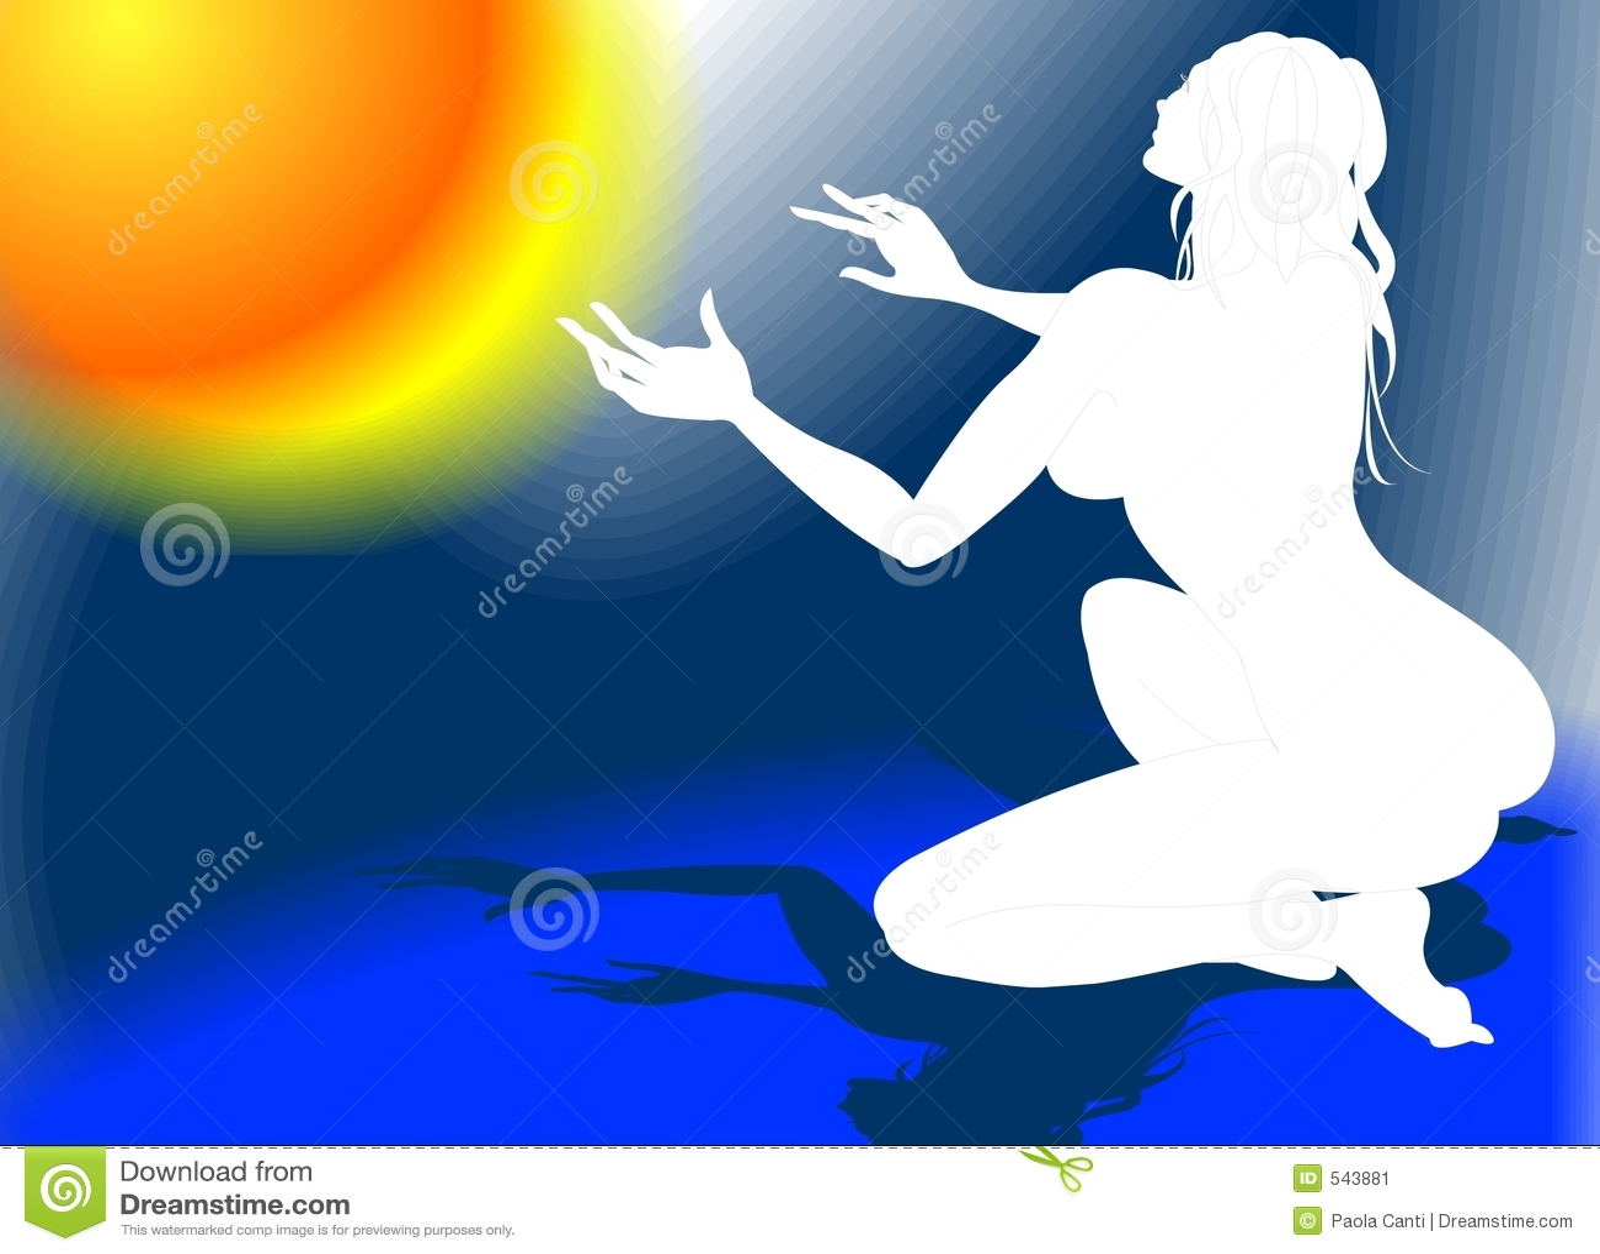 Download 自然祈祷的妇女 库存例证. 插画 包括有 硼硅酸盐, 胡言乱语的, 创建, 传单, 信念, 宝瓶星座, 集中 - 543881